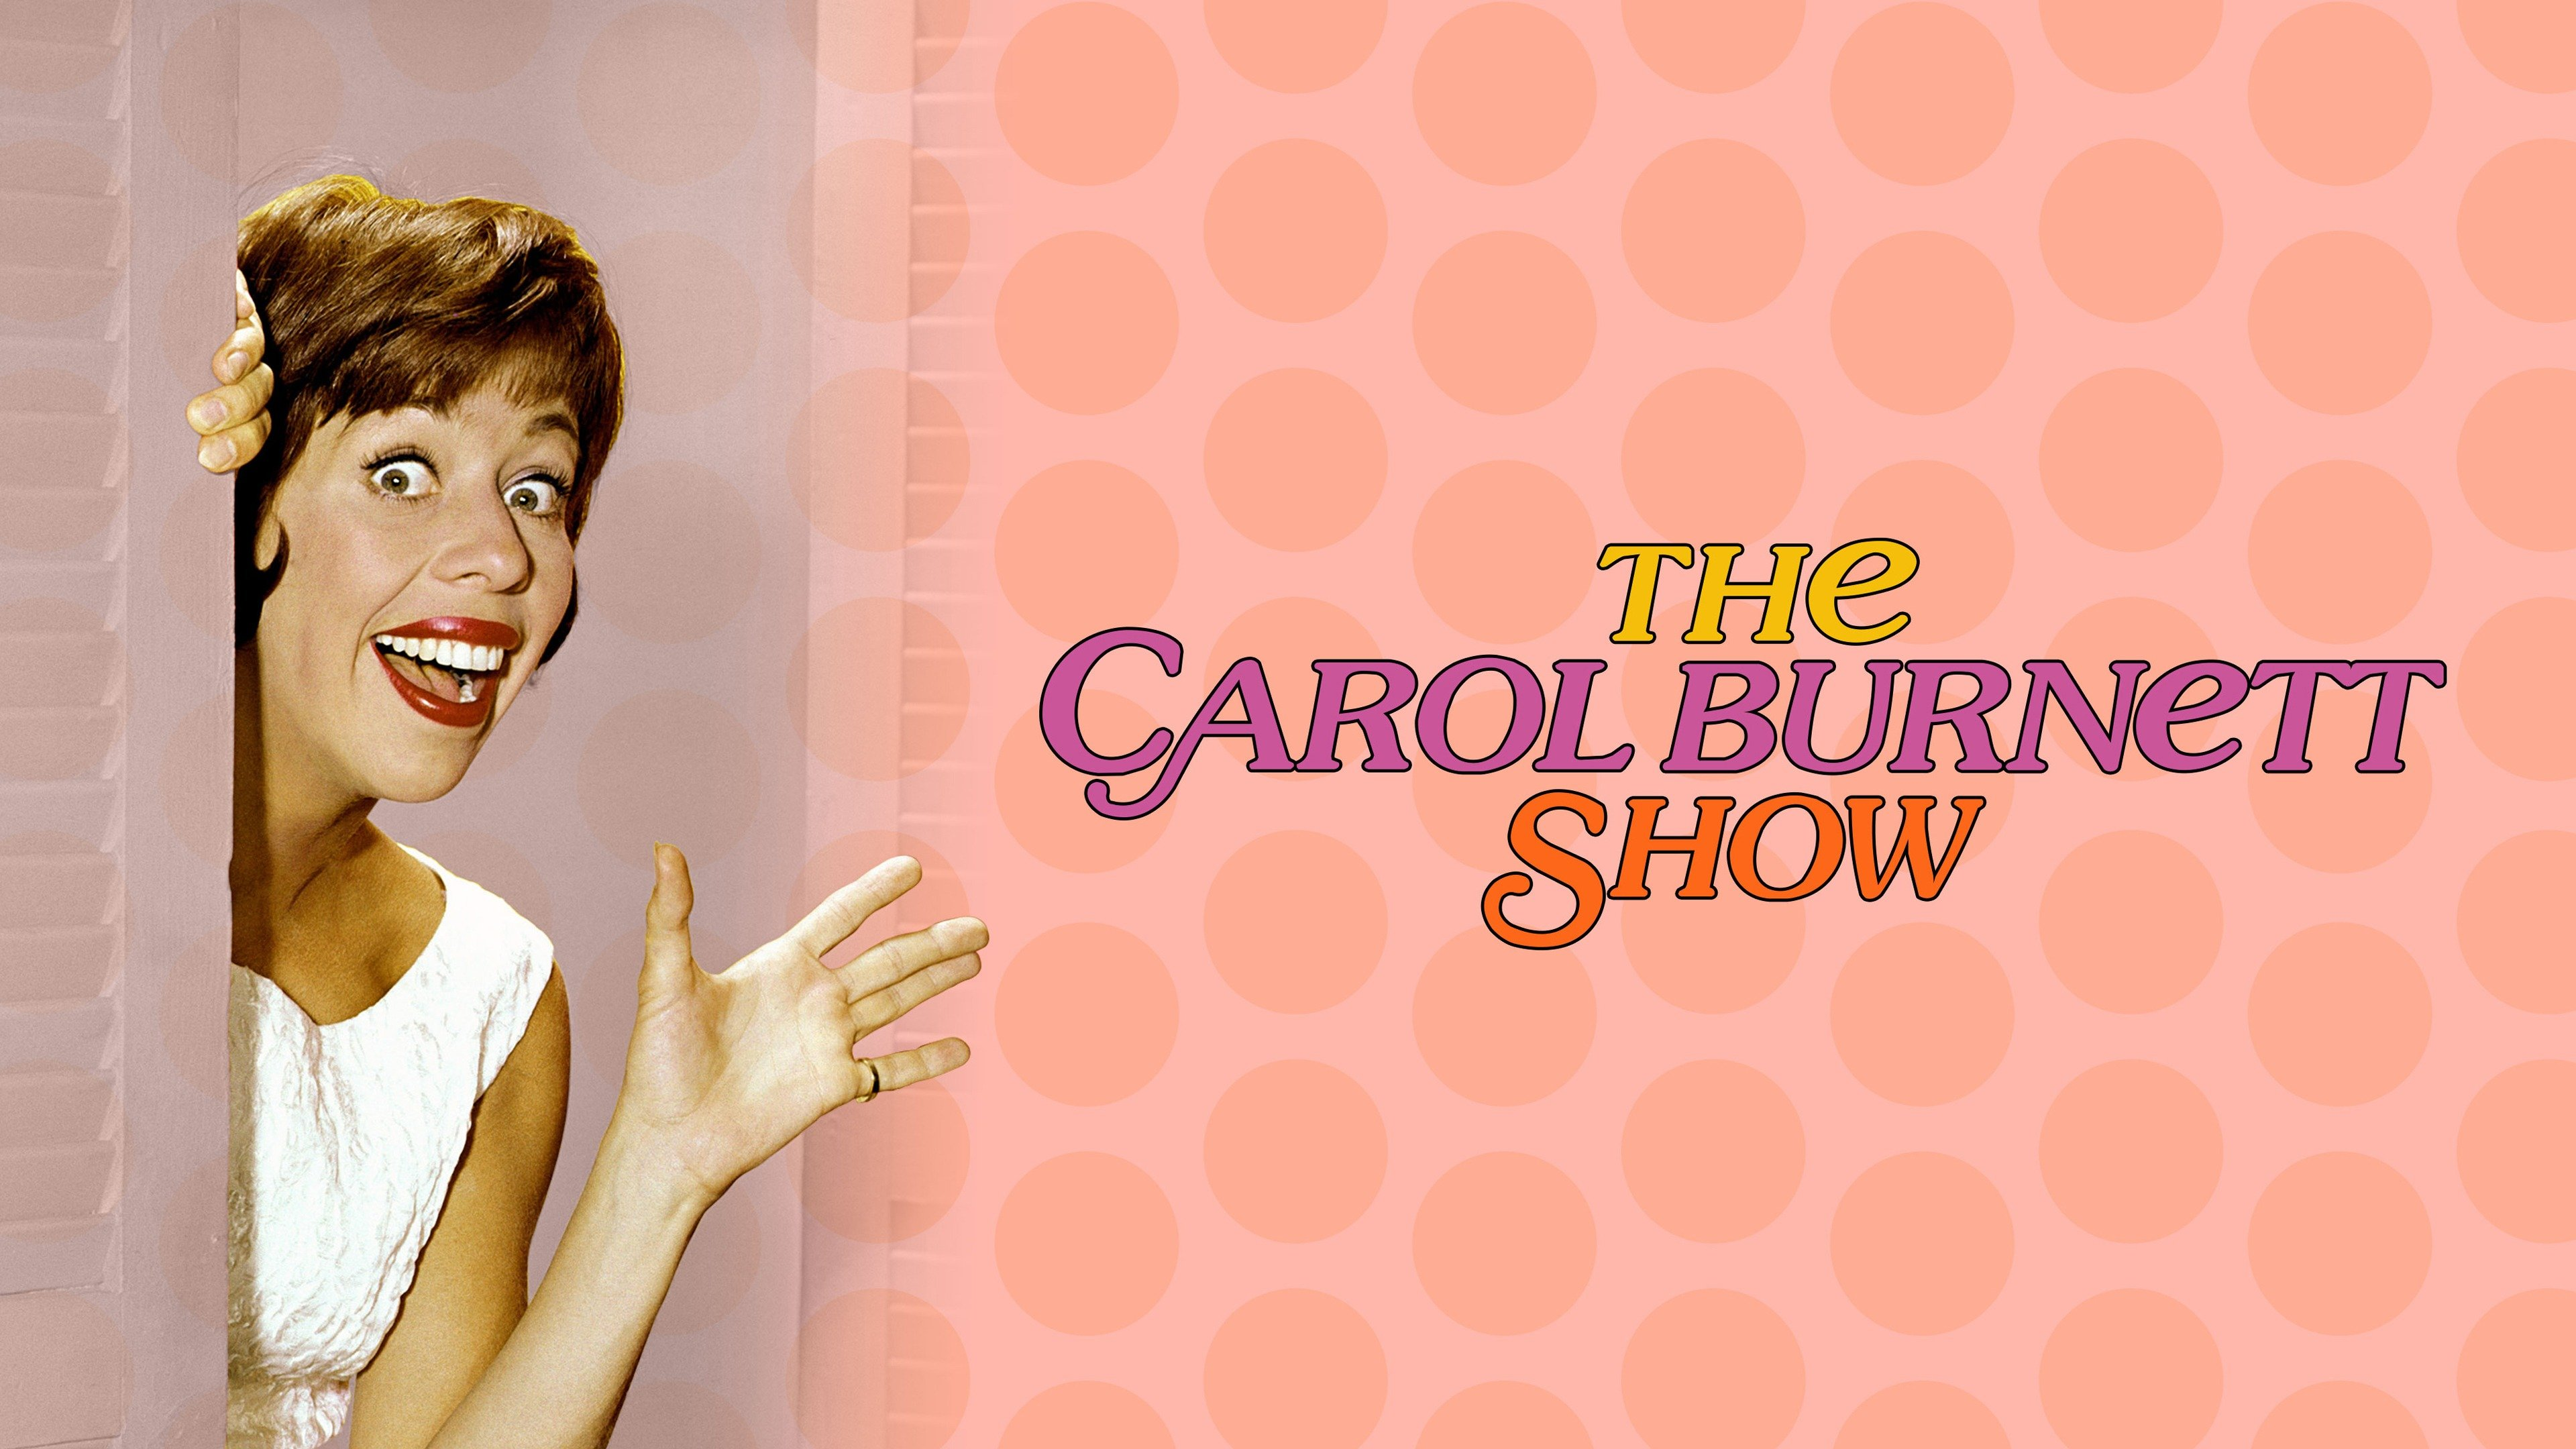 The Carol Burnett Show - CBS